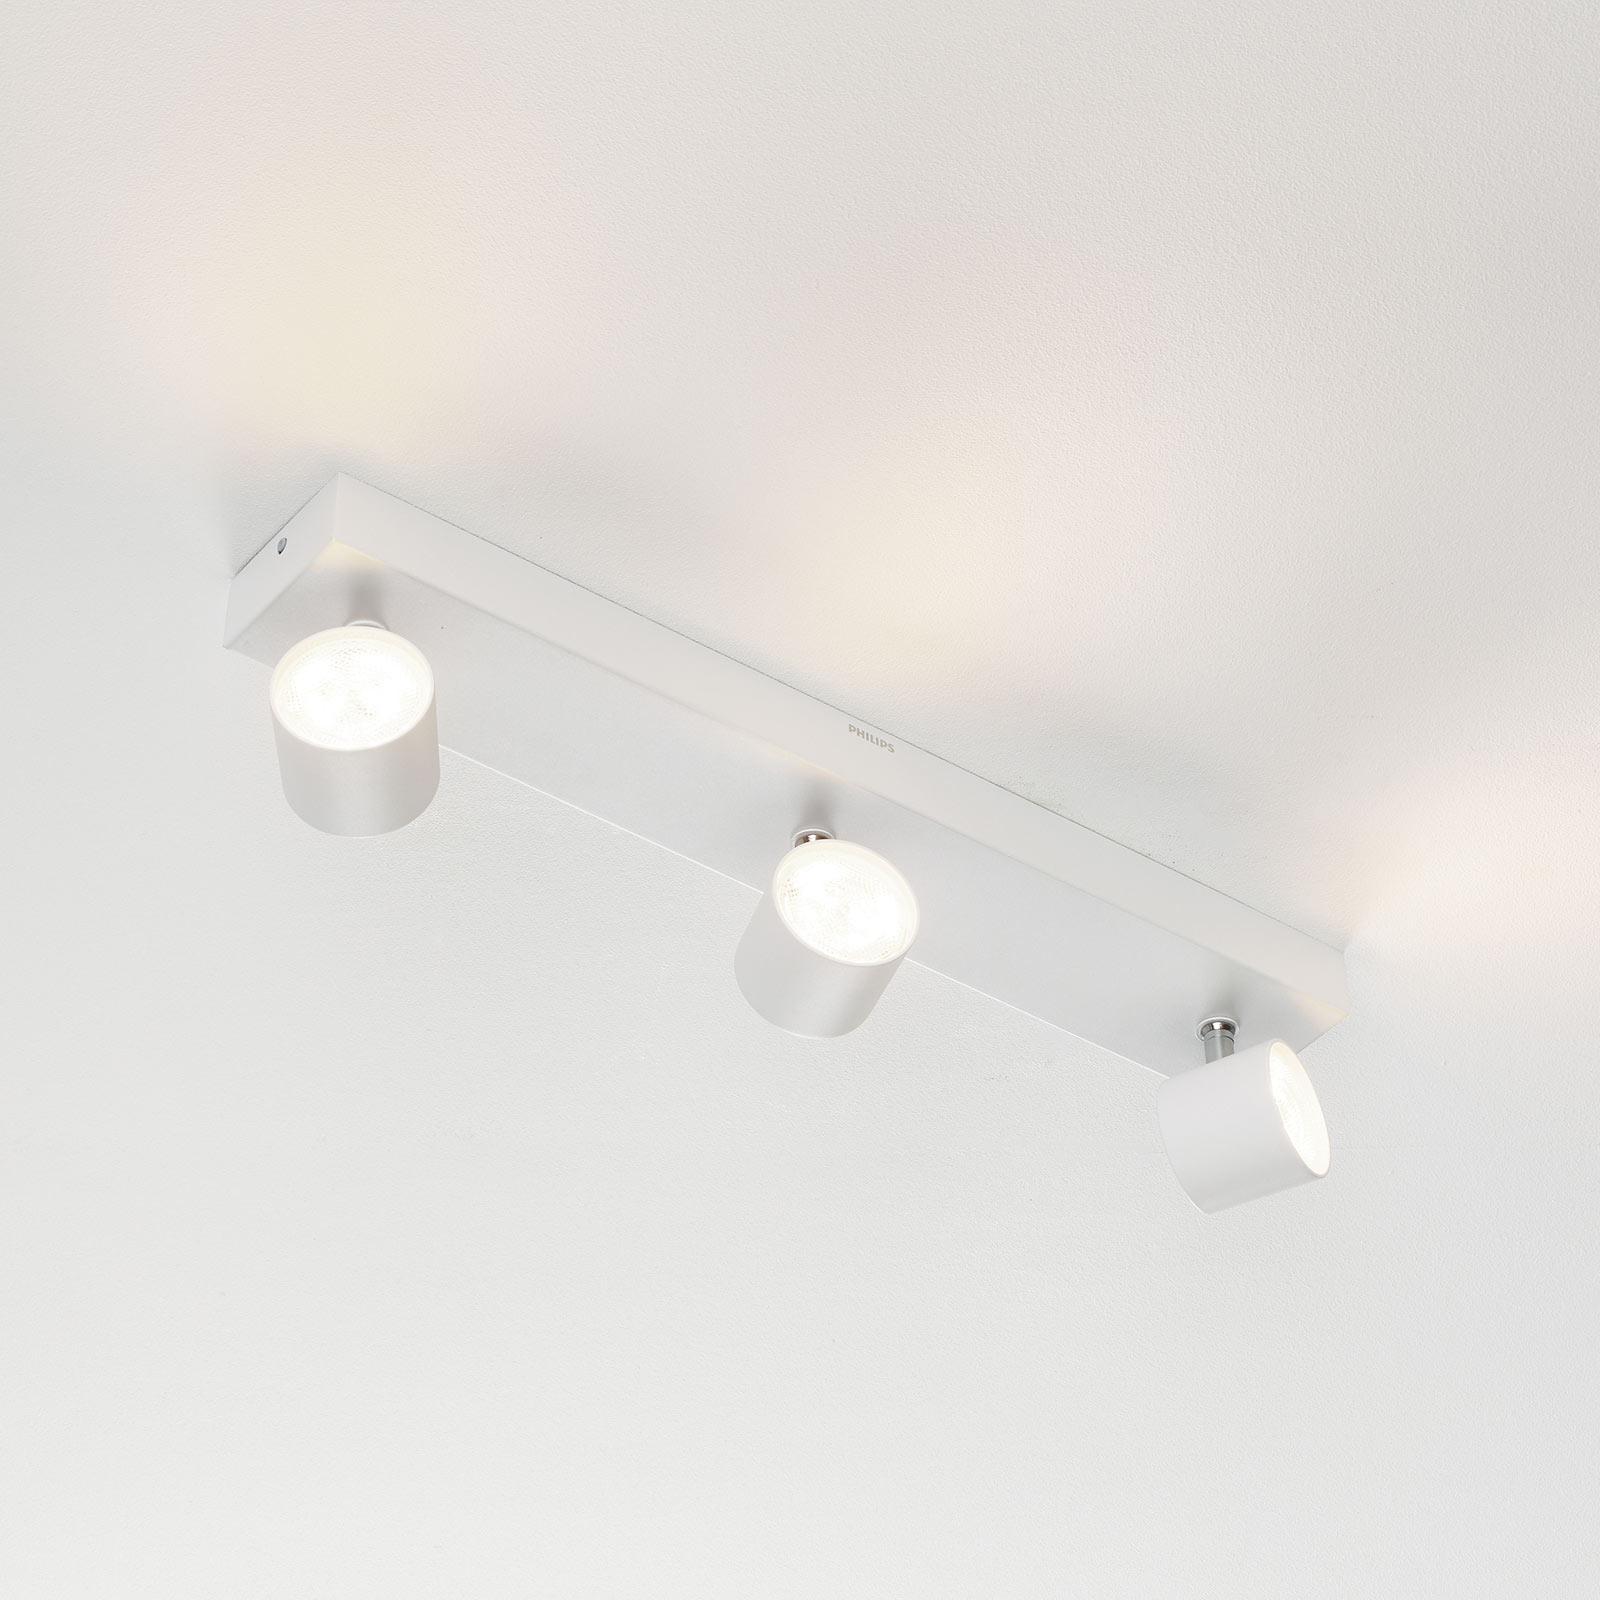 Philips Star LED-Strahler weiß 3flg. WarmGlow